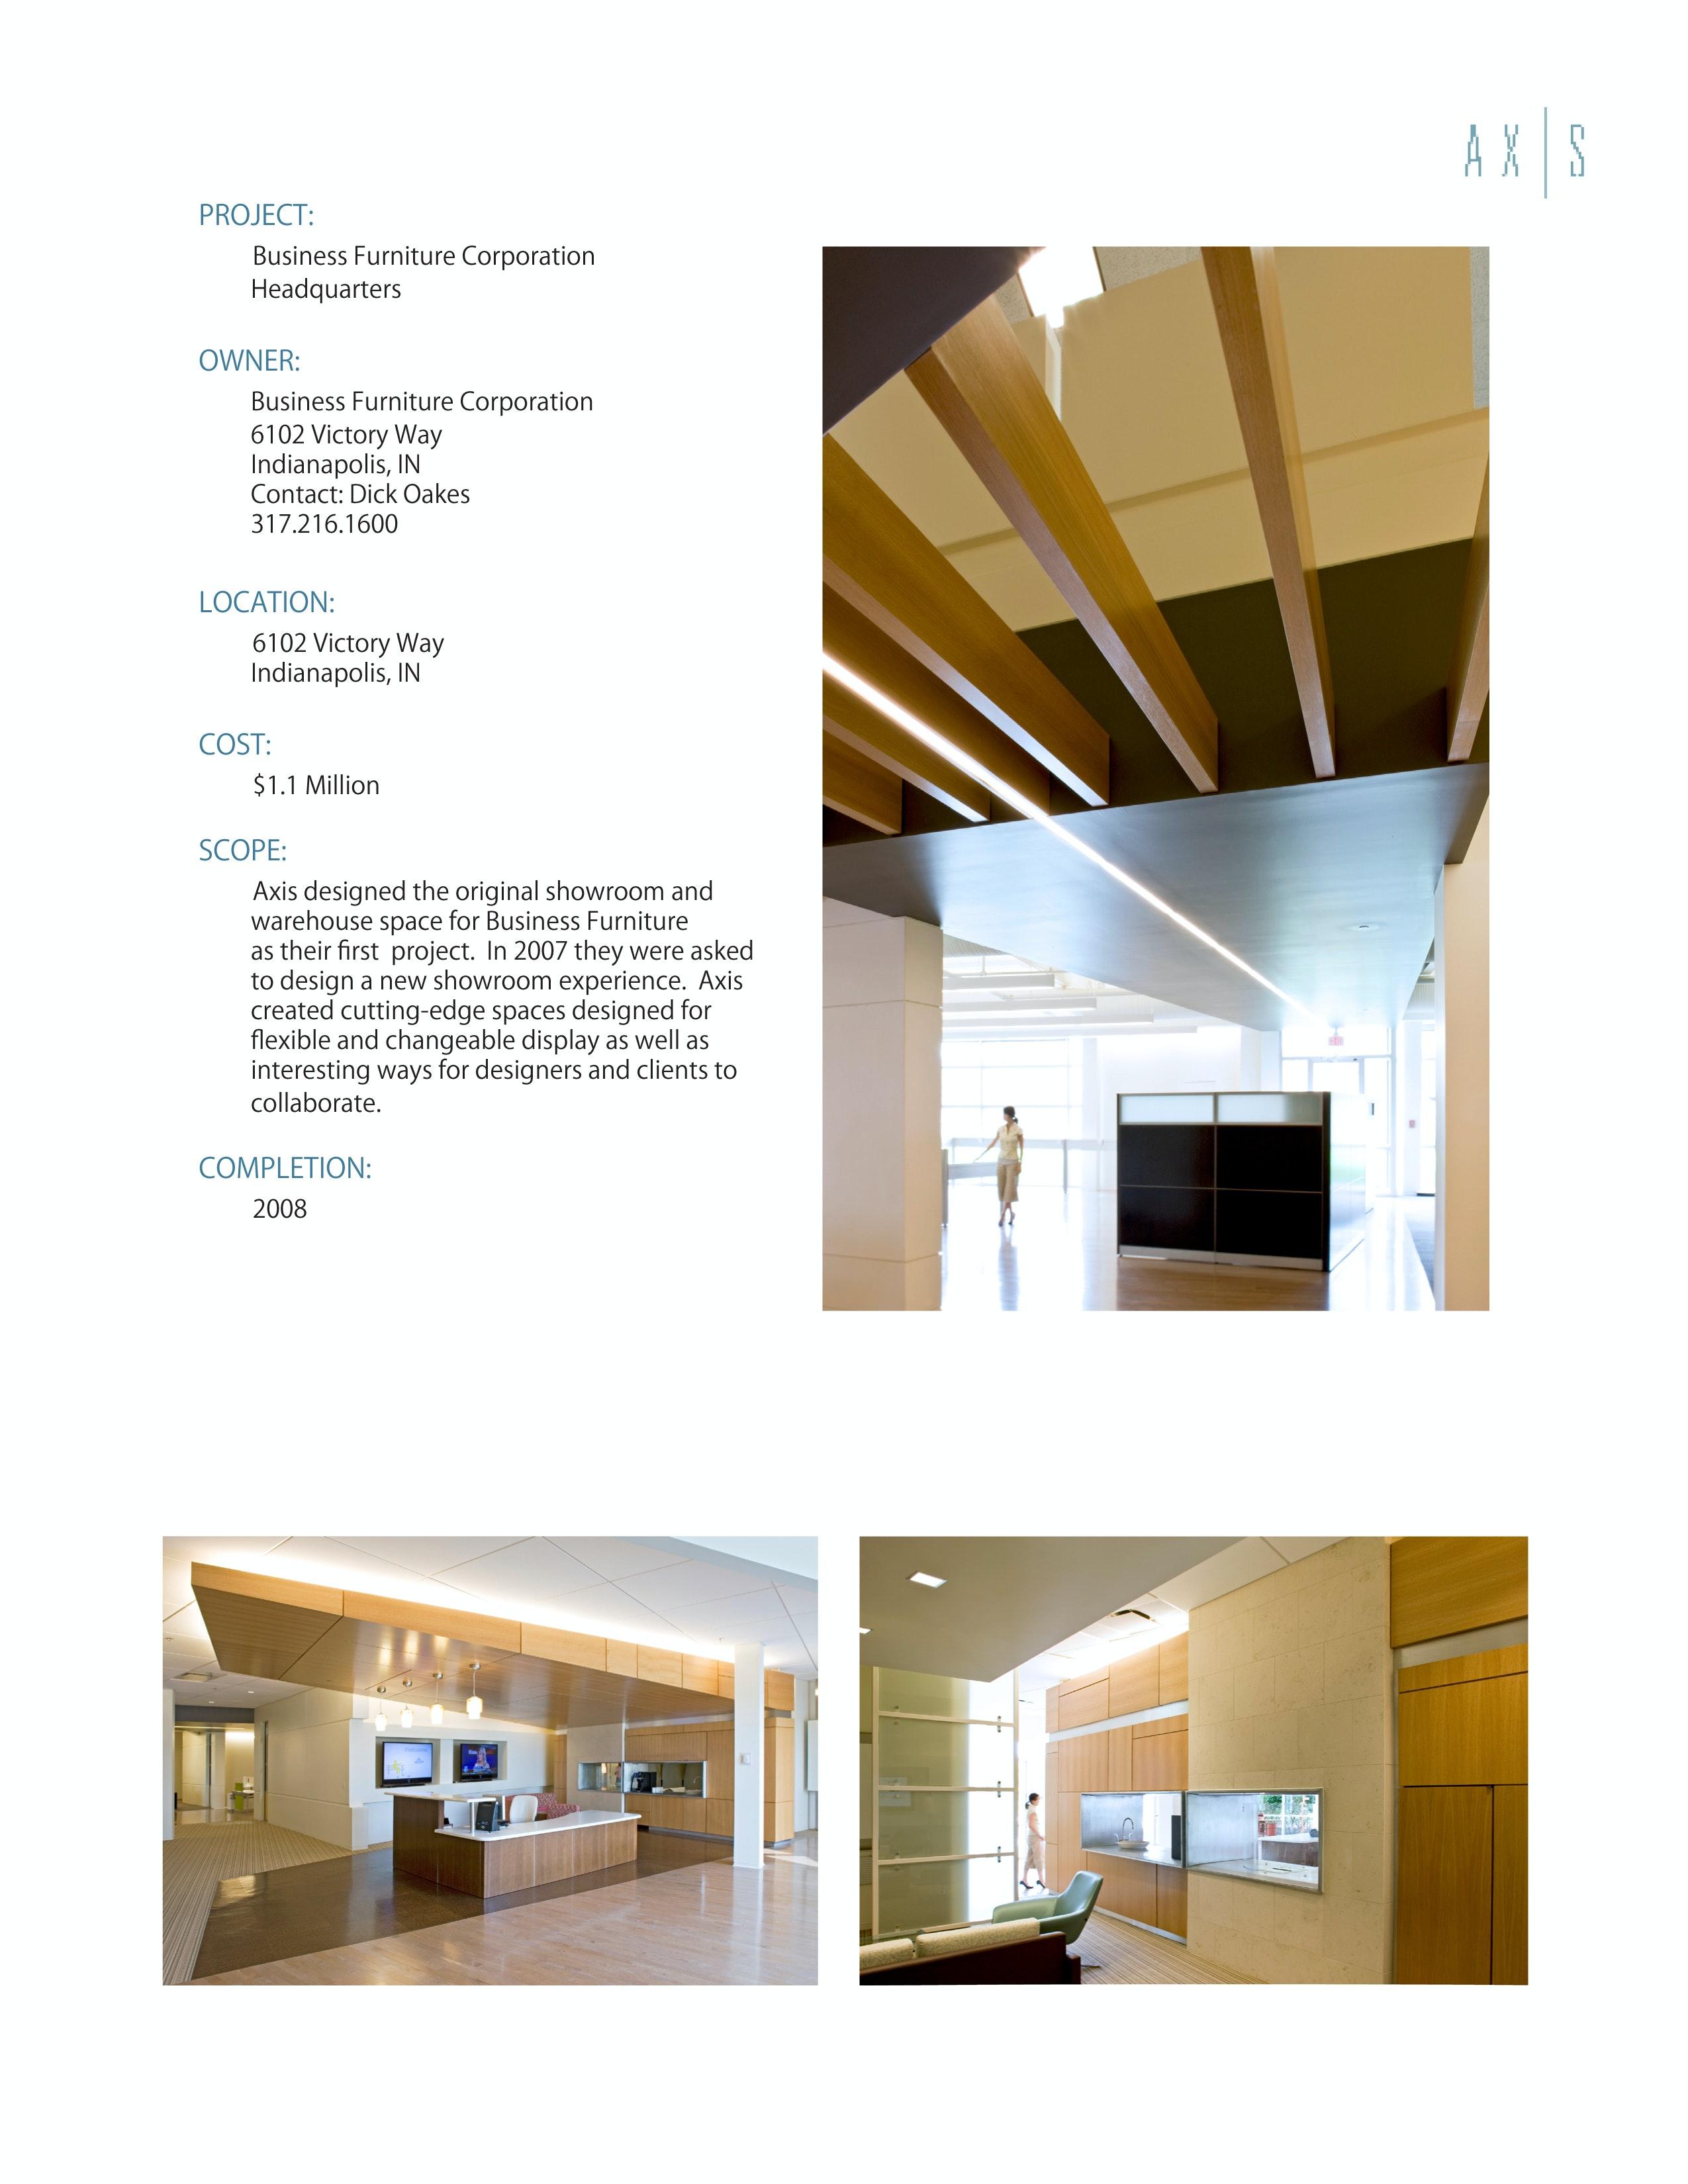 Attrayant Business Furniture Corporation Headquarters